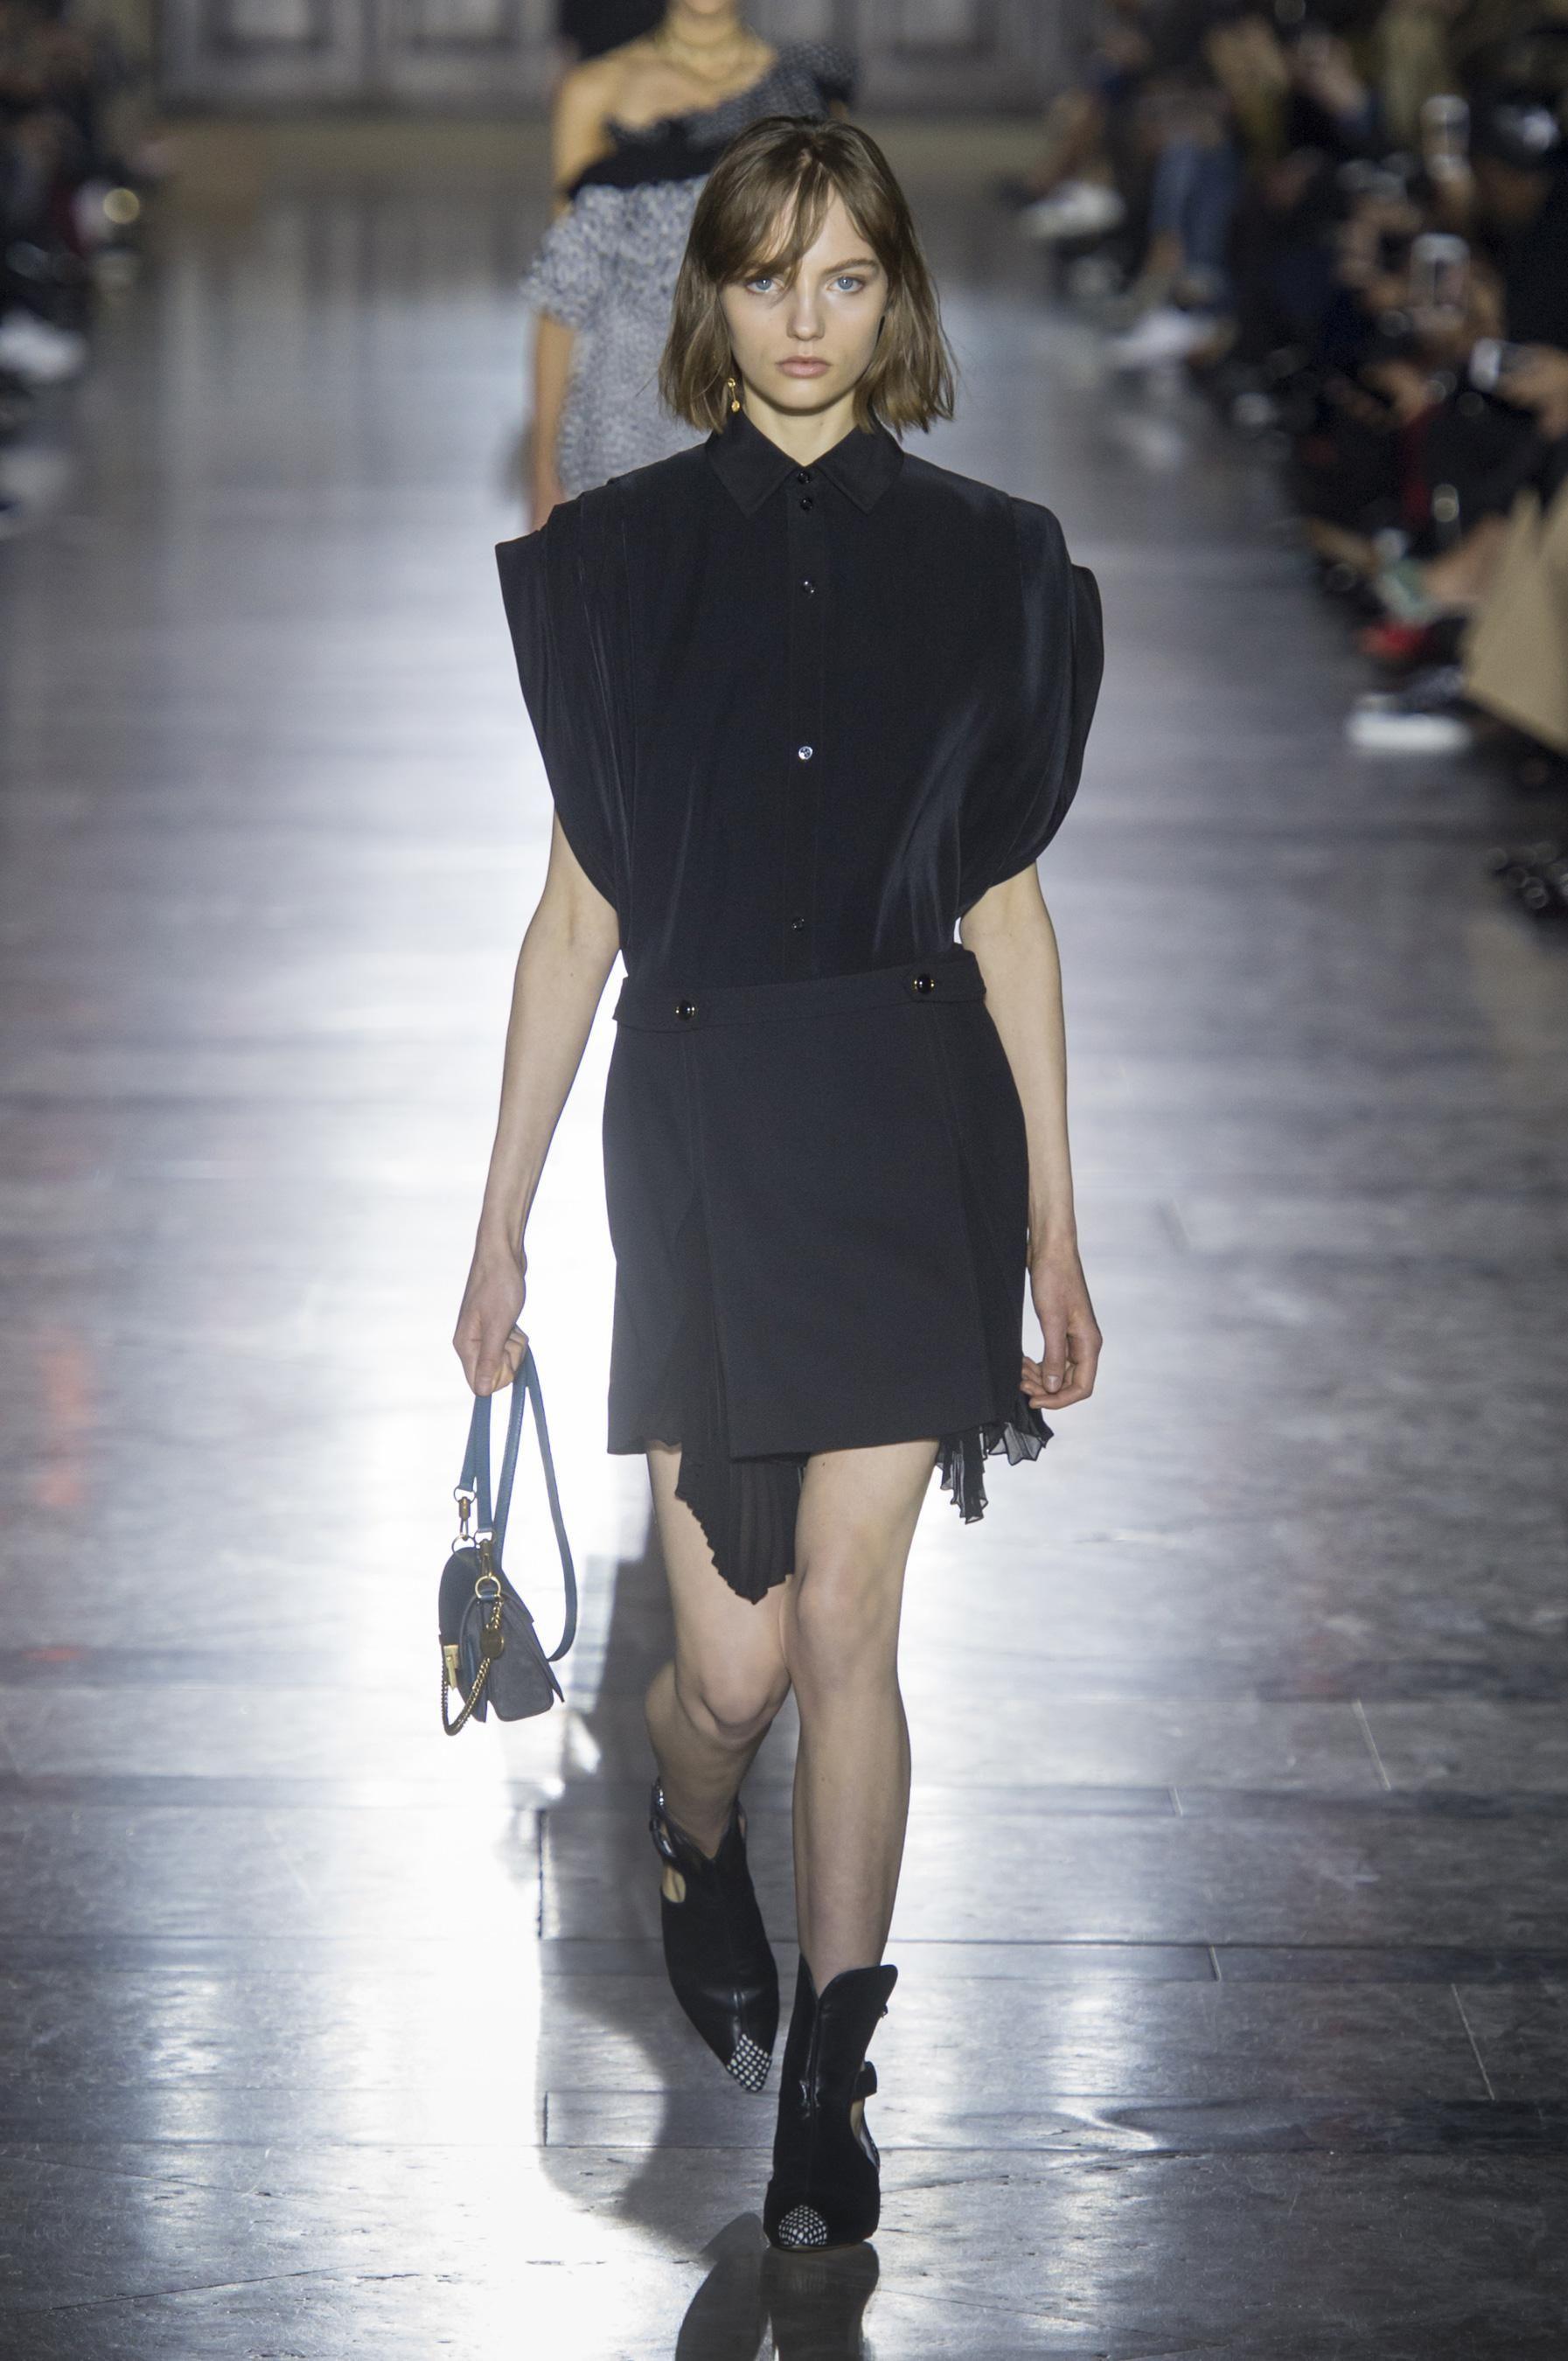 83aa4659cb90b Défilé Givenchy Printemps-été 2018 Prêt-à-porter - Madame Figaro